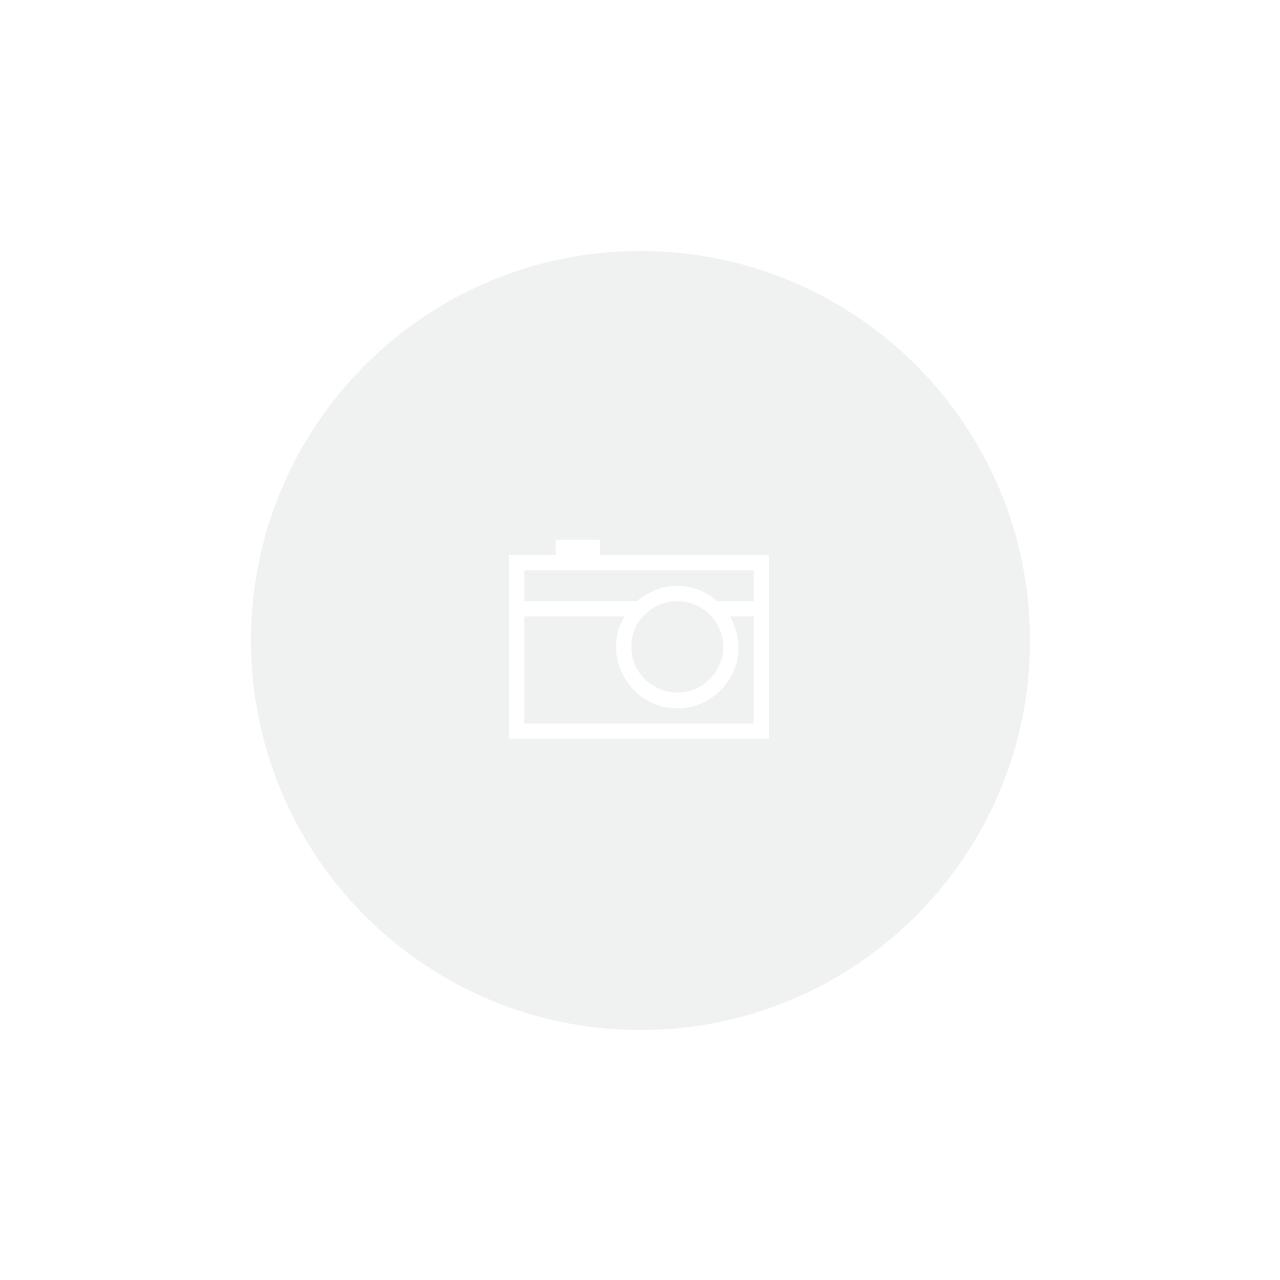 Kit Banho & Tosa Básico - 28 Itens